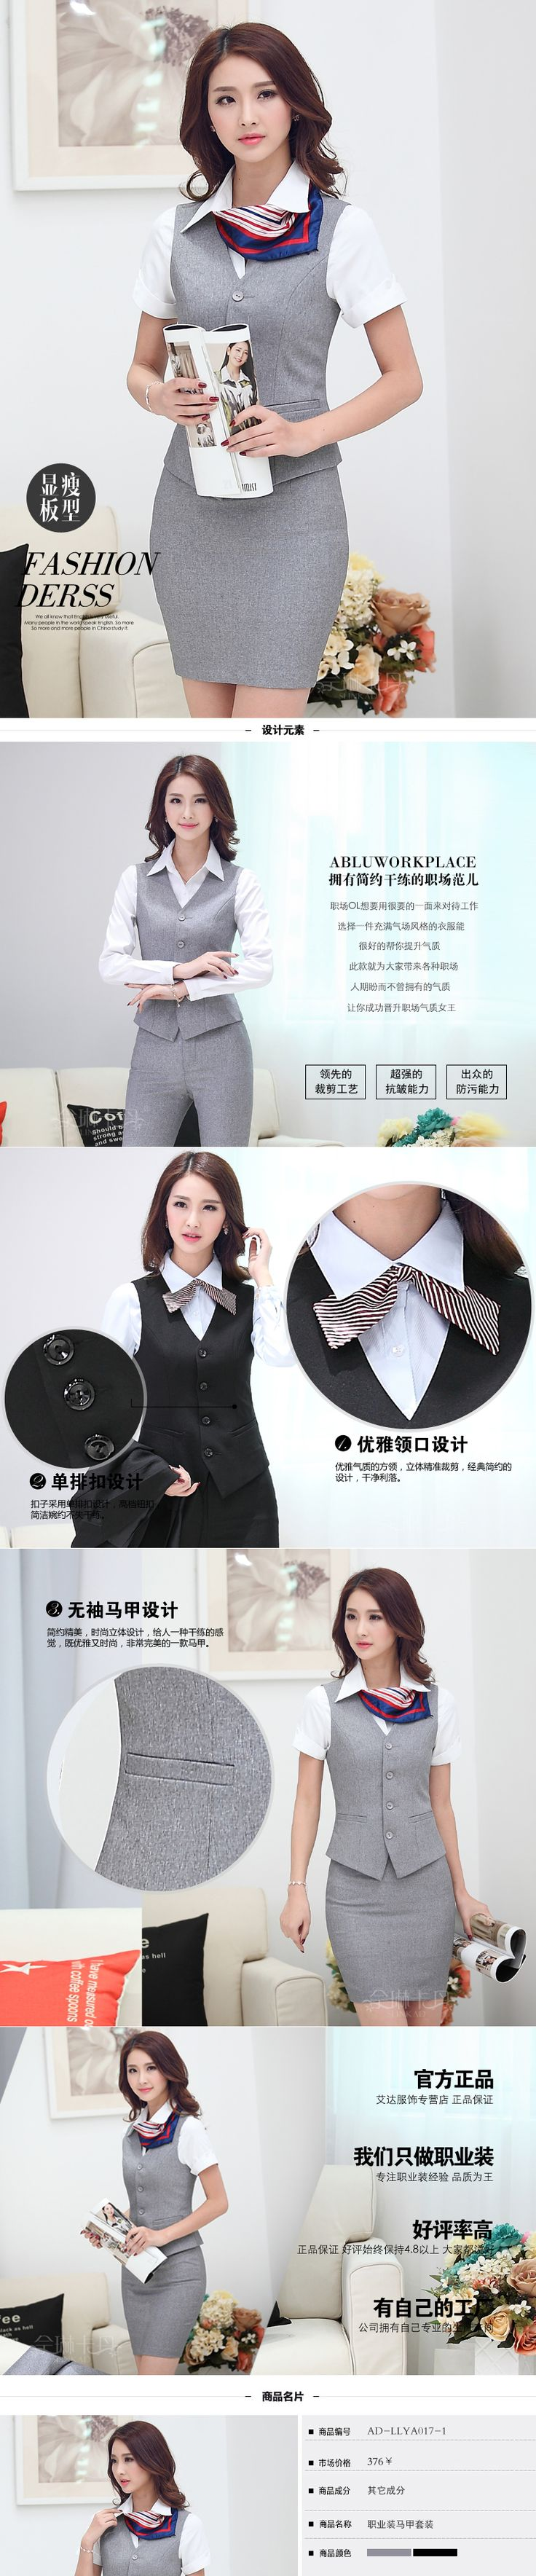 Ms. zomer nieuwe bezetting pak vest vest uniformen tooling OL witte-boorden-werkkleding van vrouwen rok -tmall.com Lynx